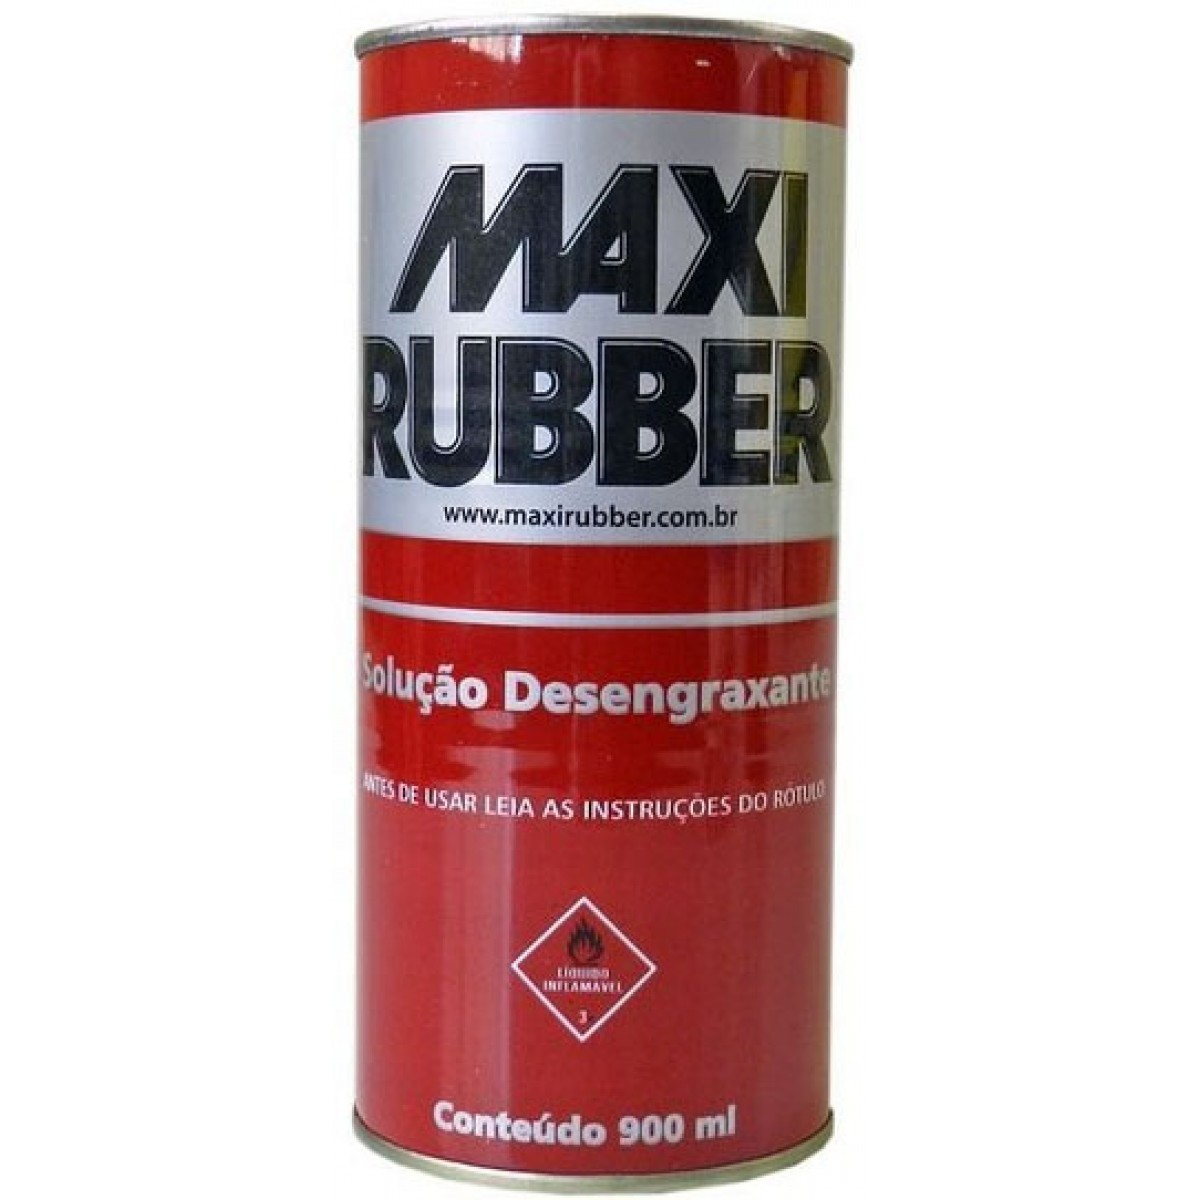 Foto 1 - Desengraxante Maxi Rubber - 900 ml